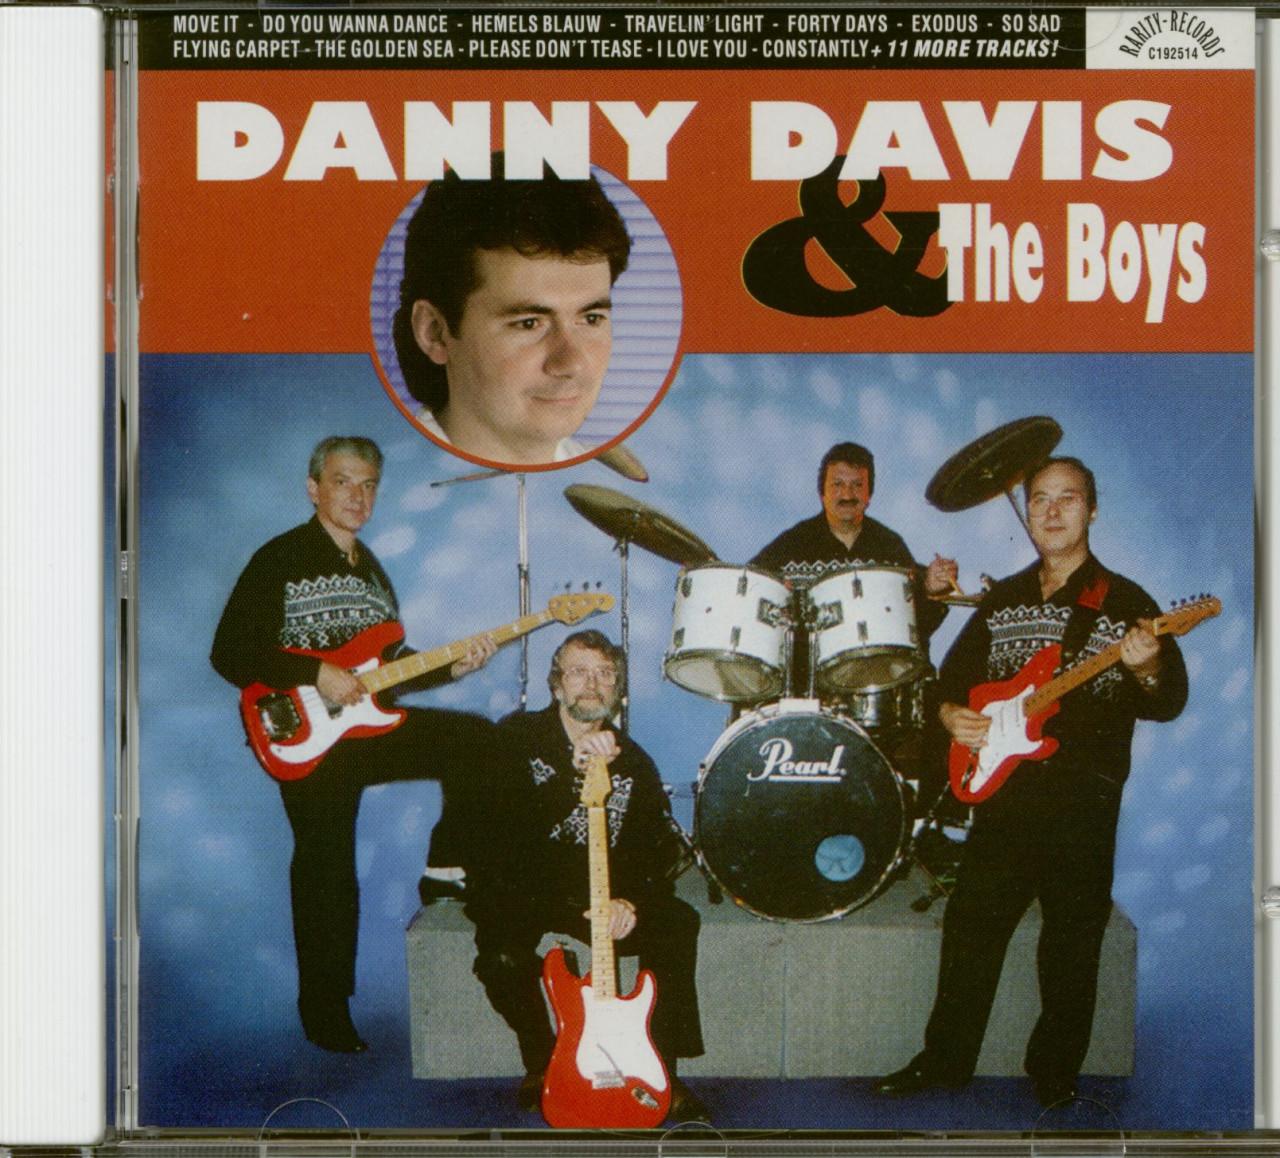 Danny Davis & The Boys - Danny Davis & The Boys (CD)